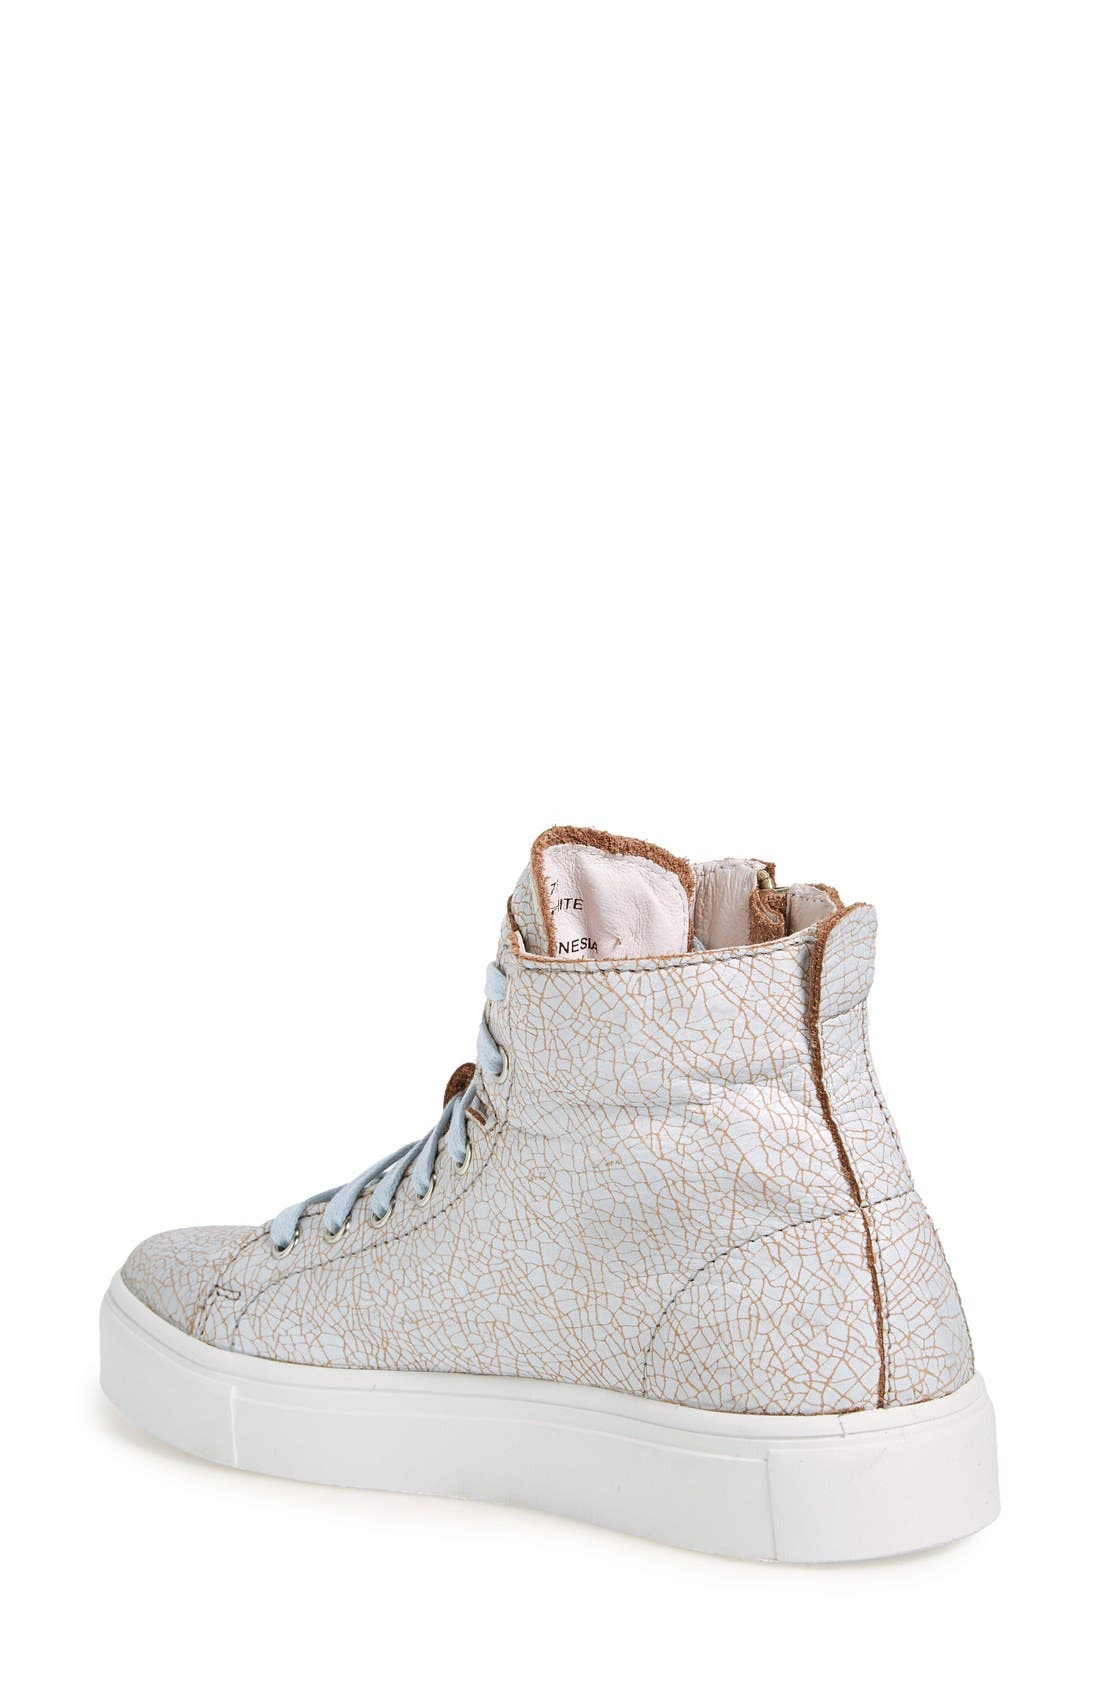 'LL78' Crackled High Top Platform Sneaker,                             Alternate thumbnail 2, color,                             Hazel/White